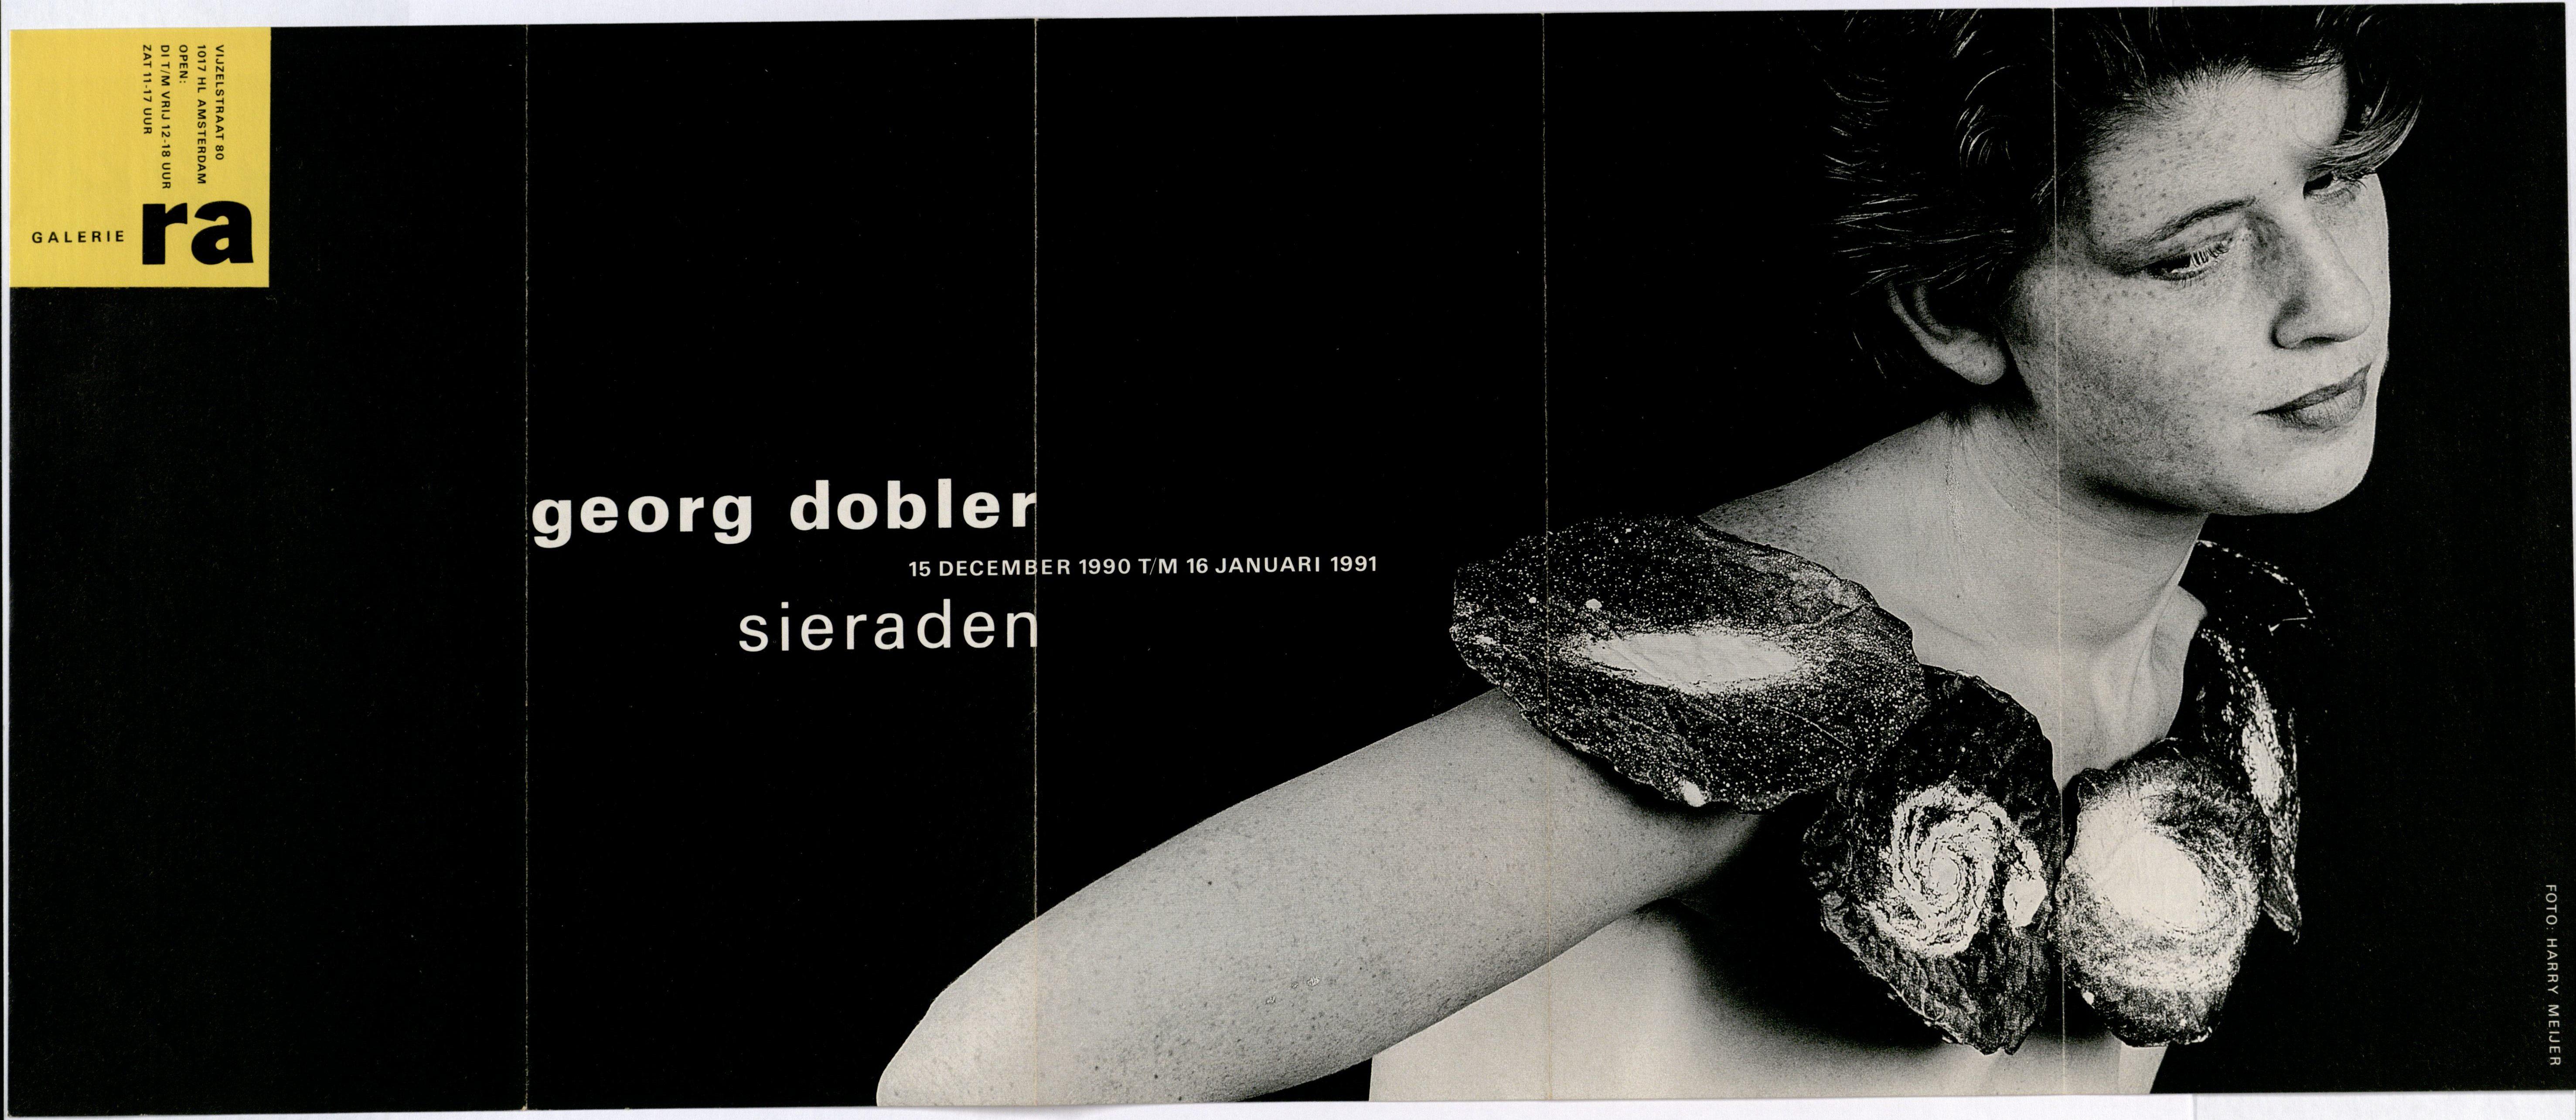 Ra Bulletin 58, december 1990, voorzijde met foto van Harry Meijer met halssieraad van Georg Dobler, drukwerk, papier